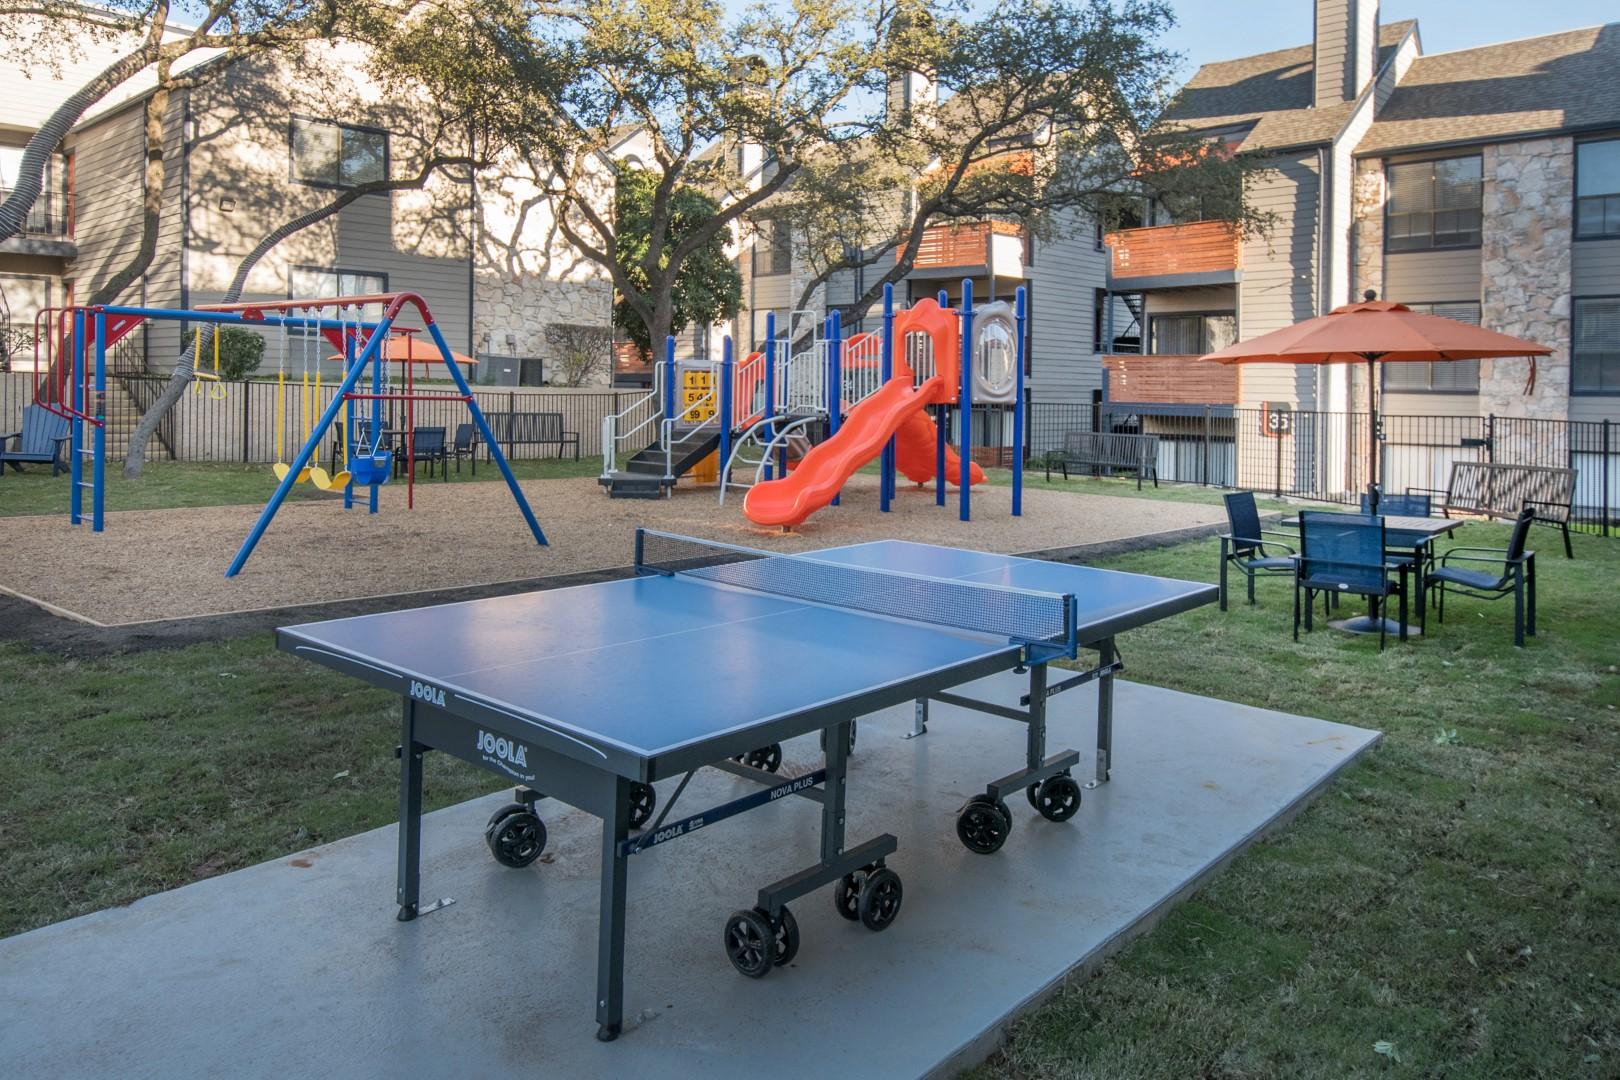 ping pong northwest san antonio apartments